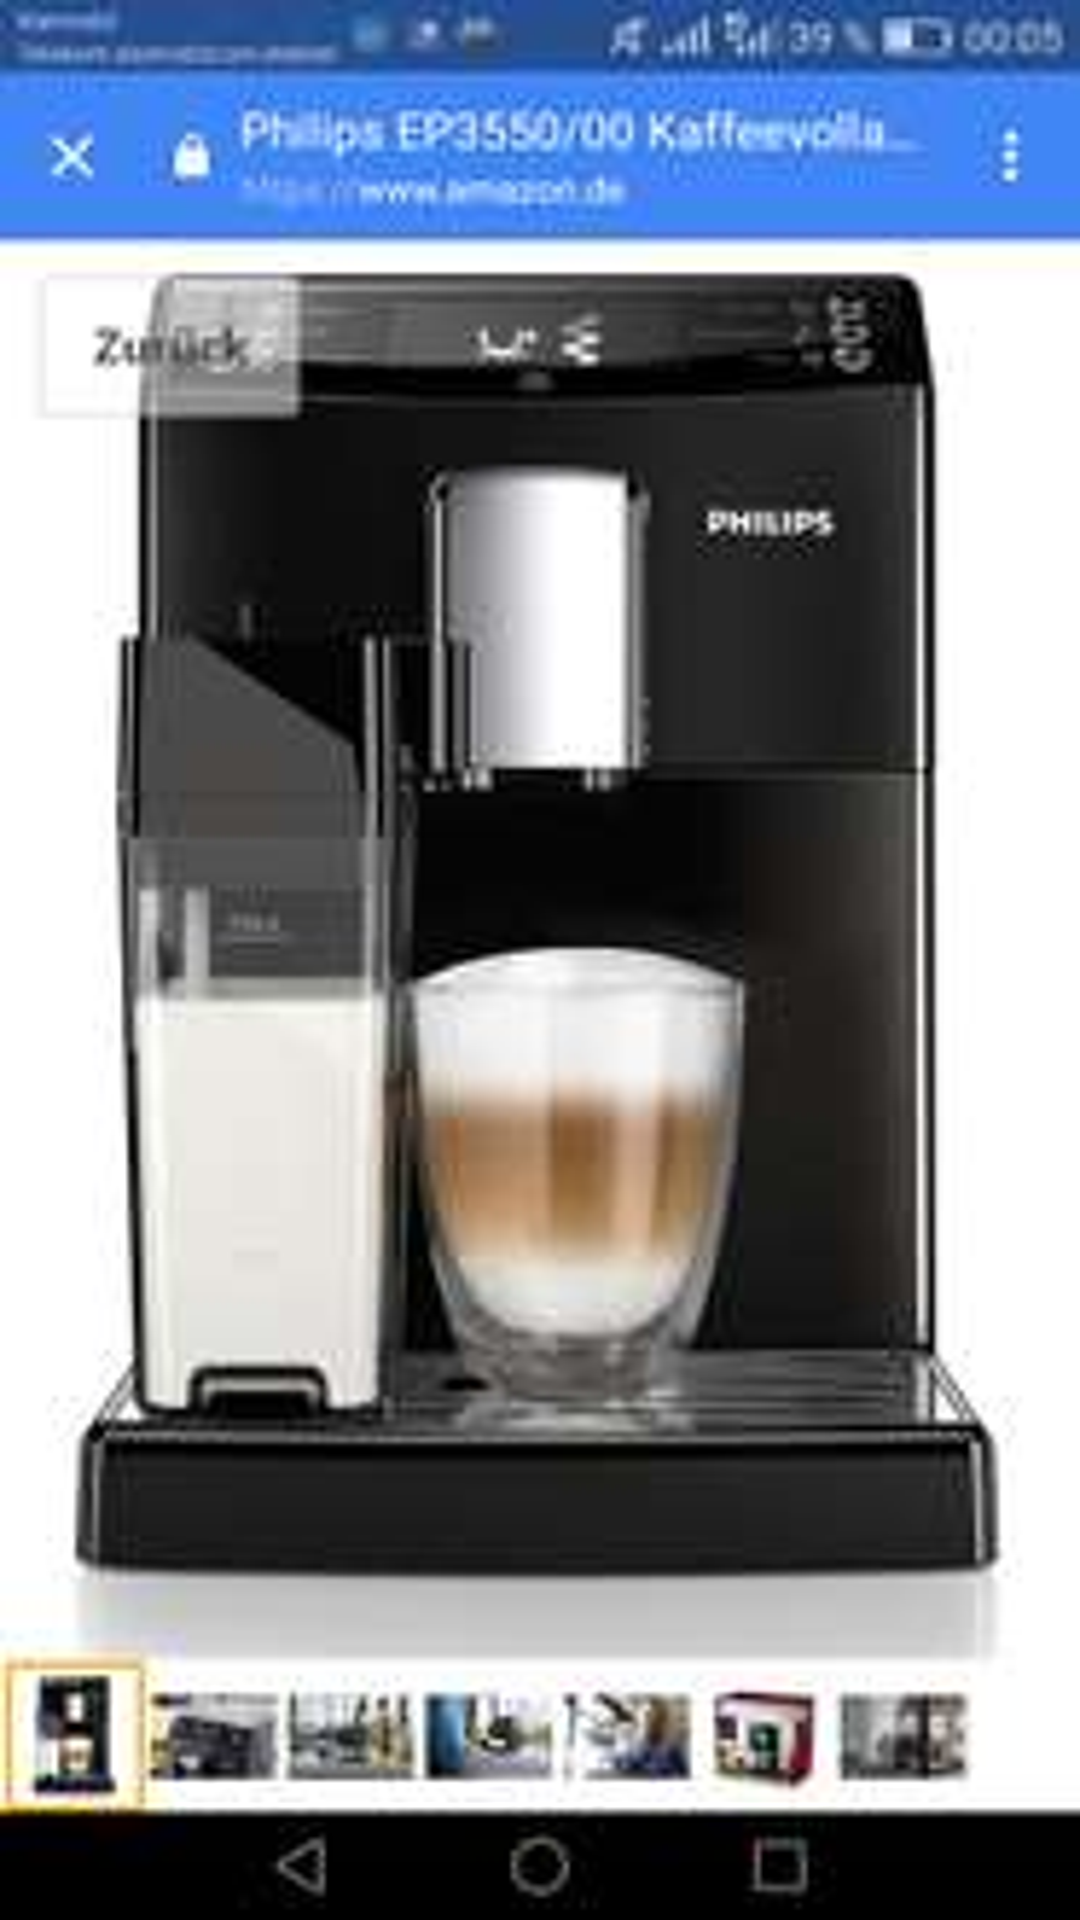 Philips EP3550/00 Kaffeevollautomat, Milchkaraffe, AquaClean, schwarz, amazon